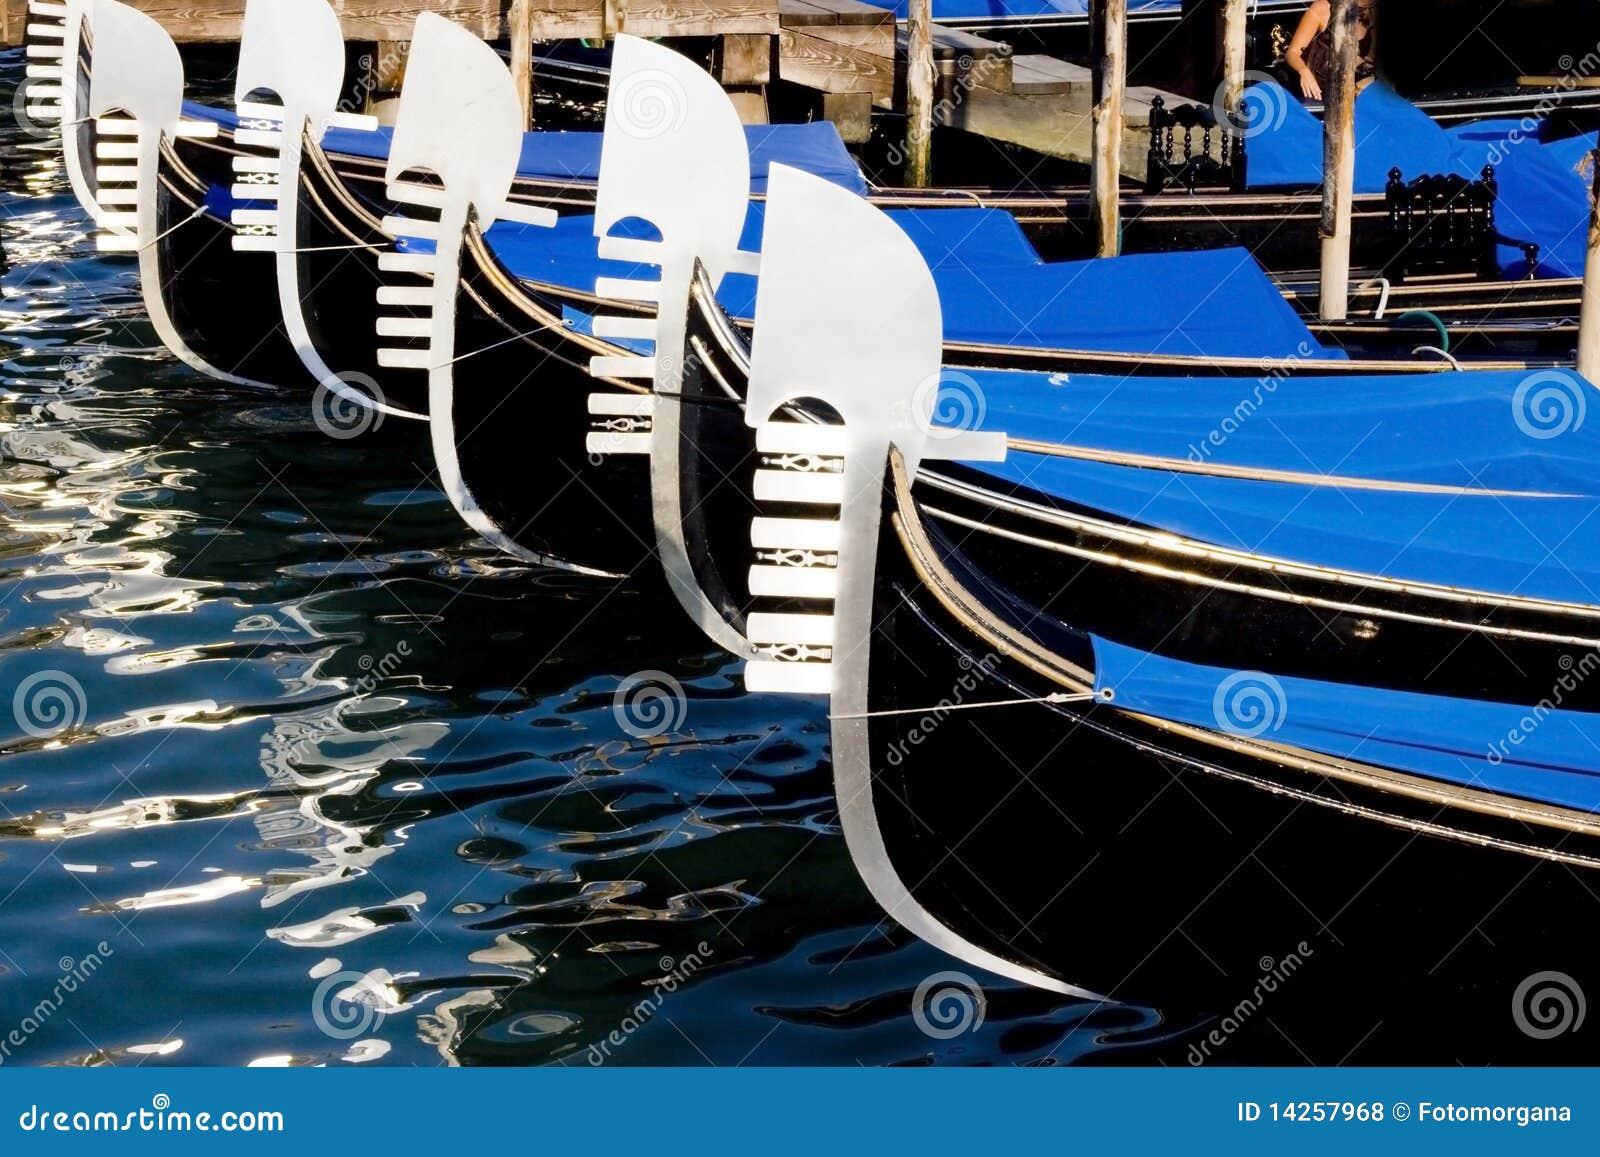 Gondola boats in venice stock photo. Image of color, harbor - 14257968